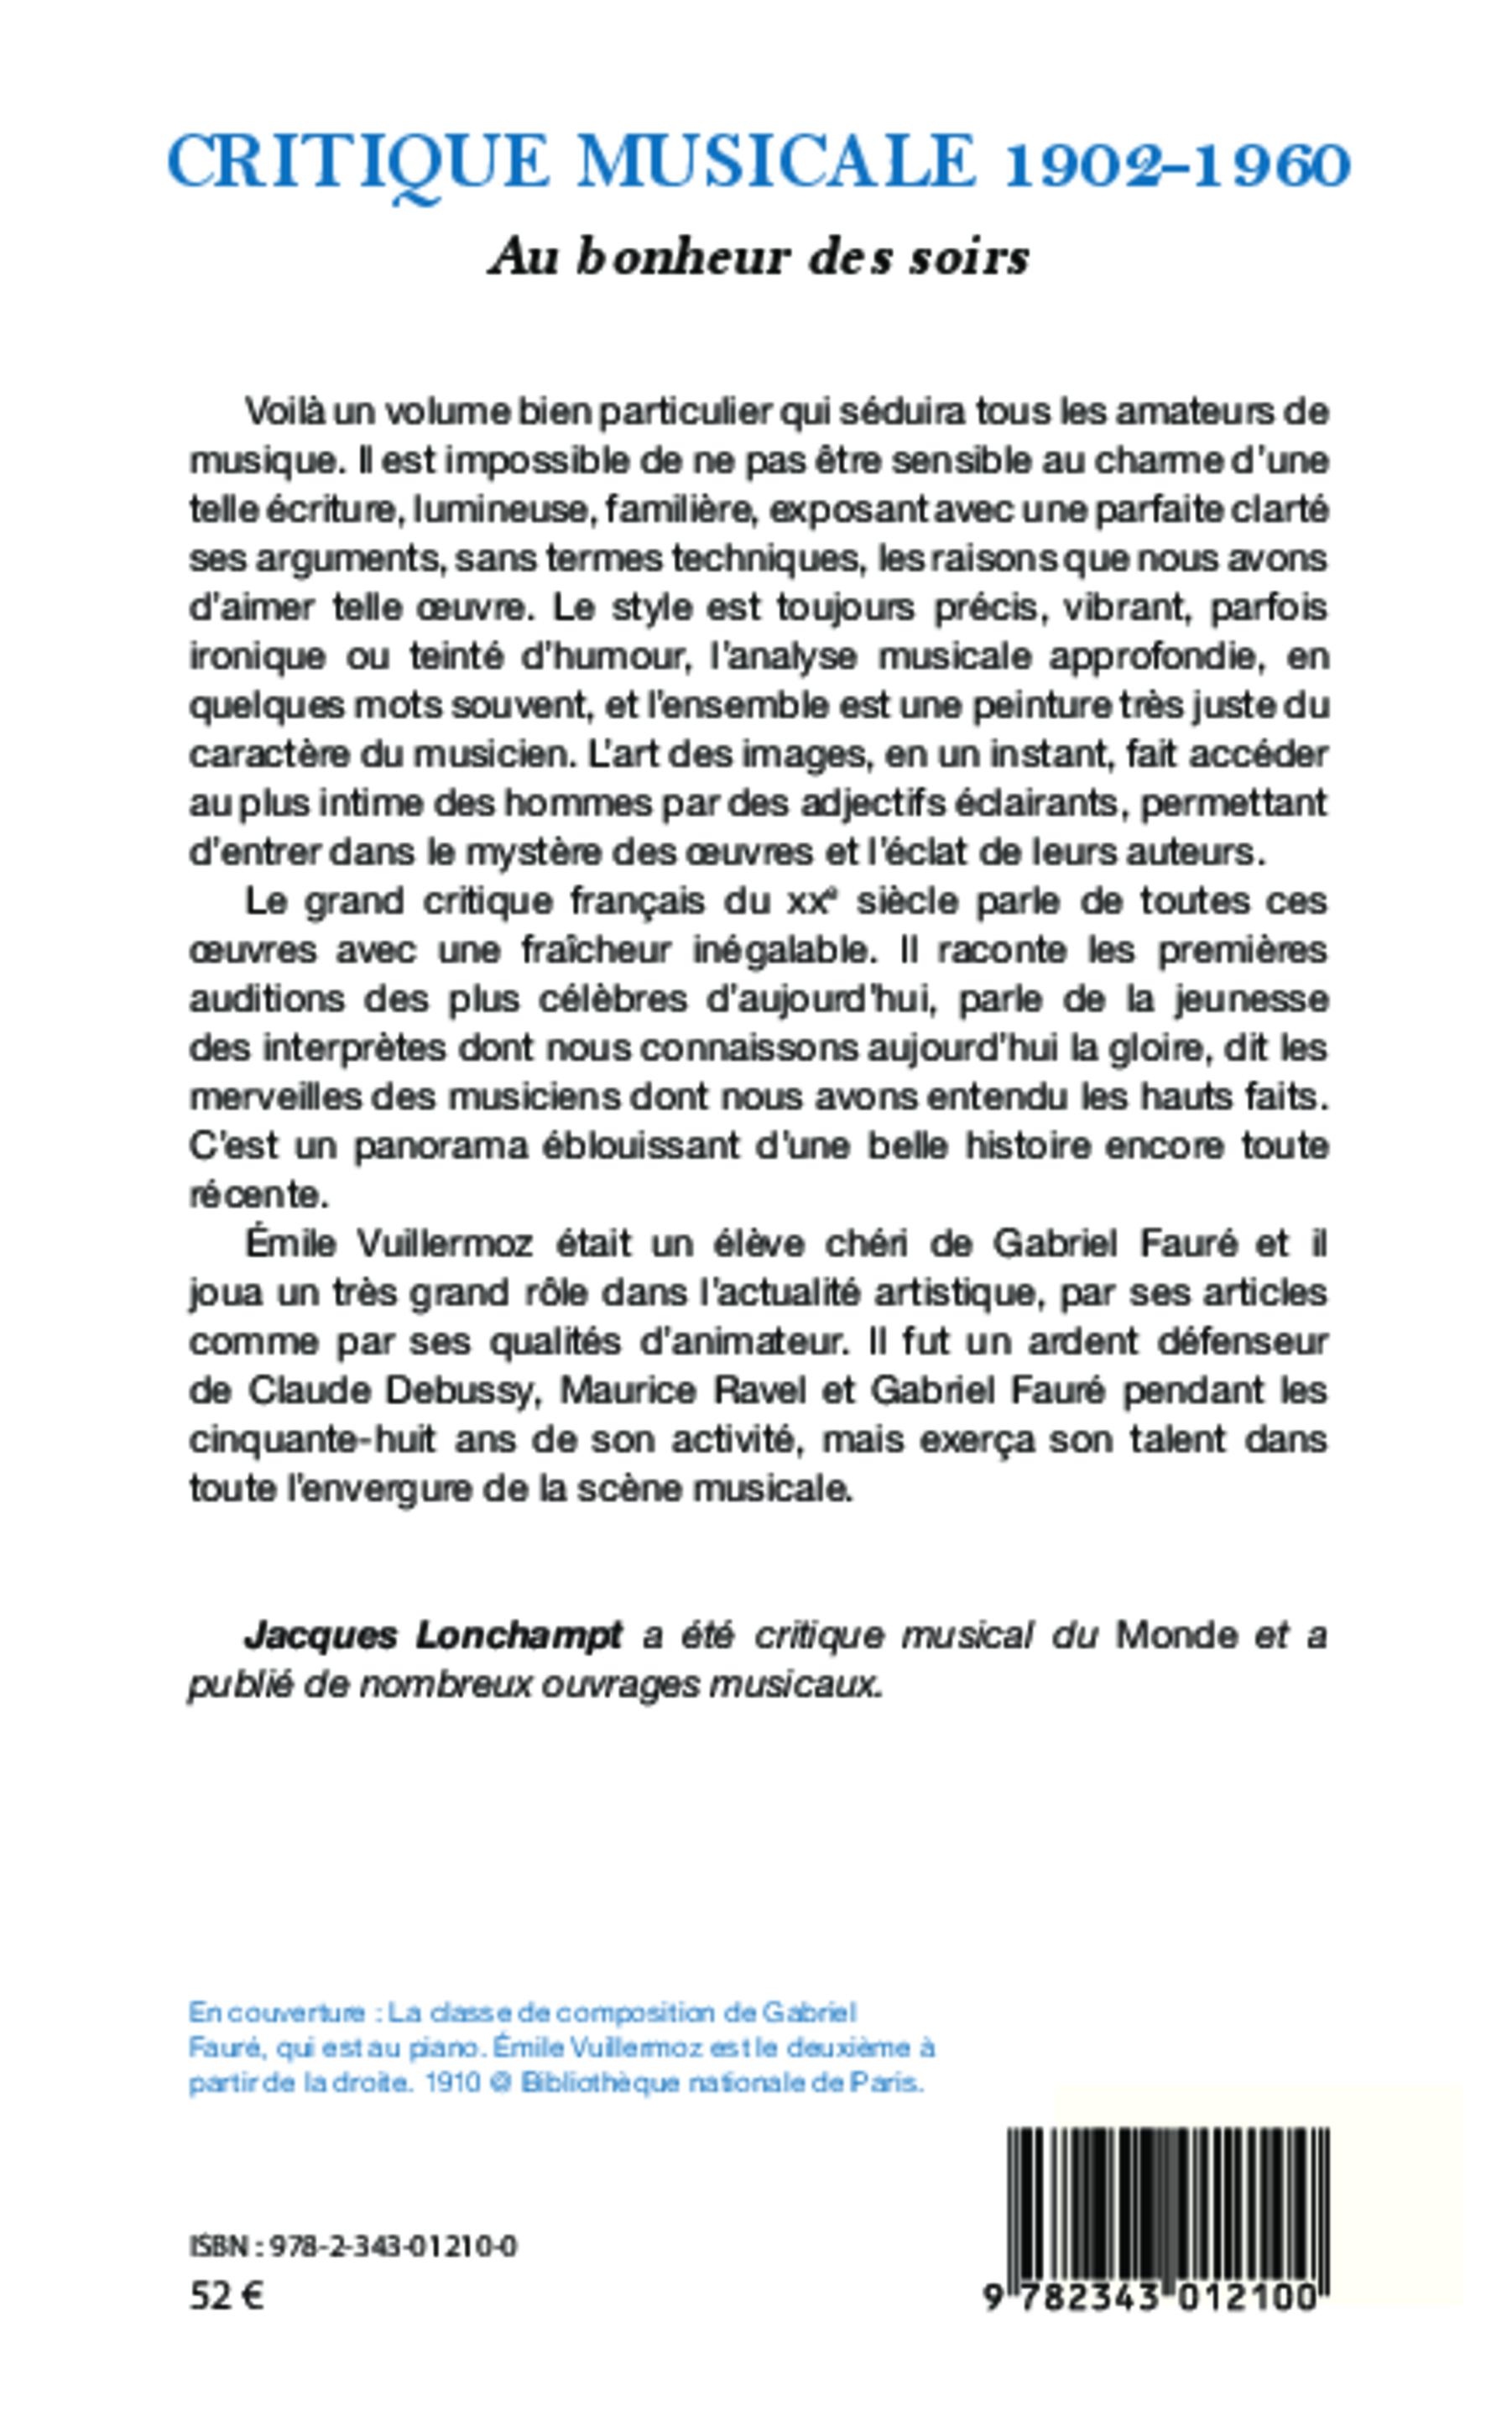 http://www.editions-harmattan.fr/catalogue/couv/9782343012100v.jpg